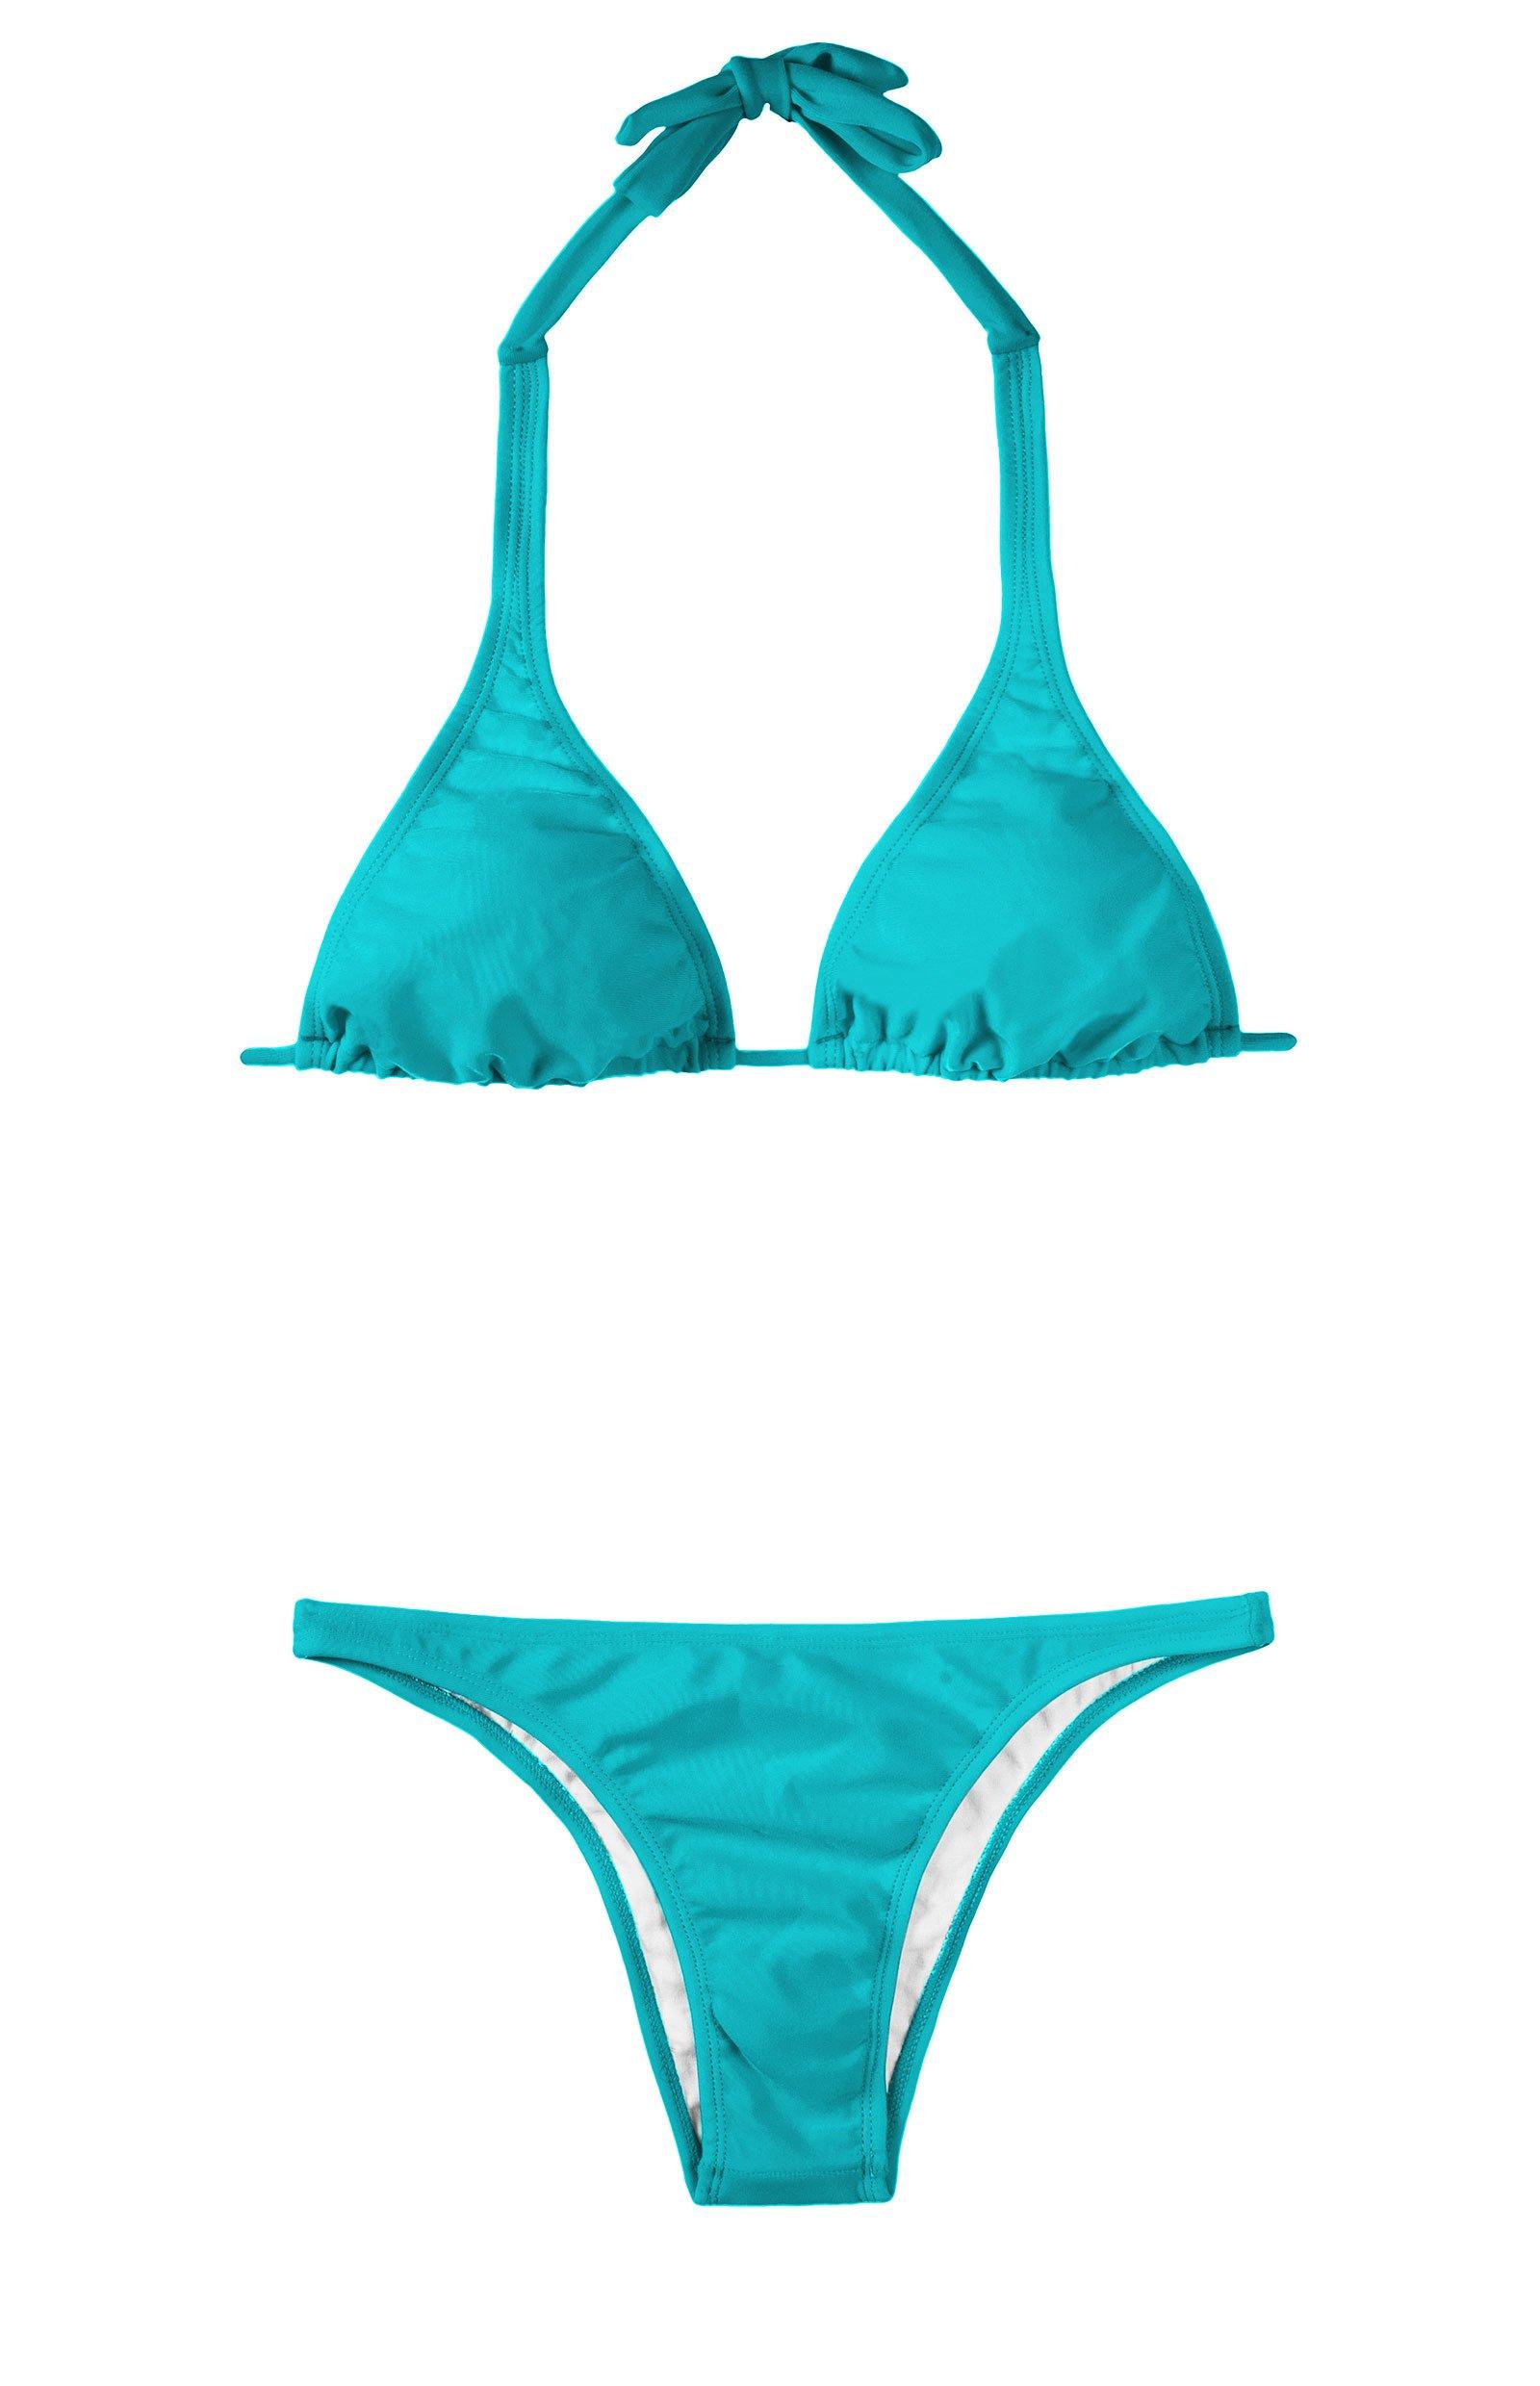 Brasilianischer Triangle-tuch-bikini, Blau - Tahiti Cortinao Basic